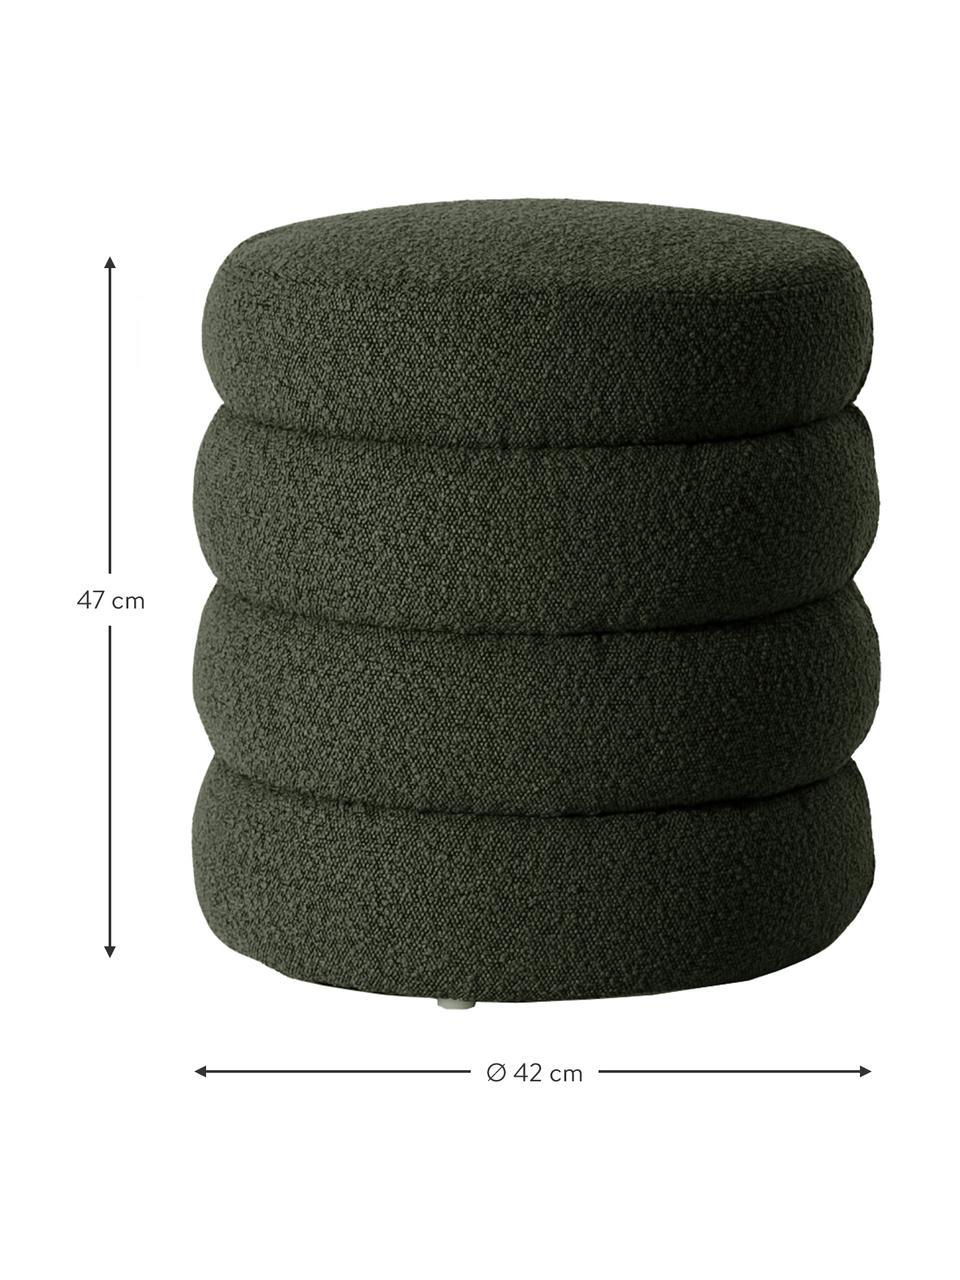 Bouclé-Hocker Alto in Grün, Bezug: Bouclé (100% Polyester) D, Gestell: Massives Kiefernholz, Spe, Bouclé Grün, Ø 42 x H 47 cm